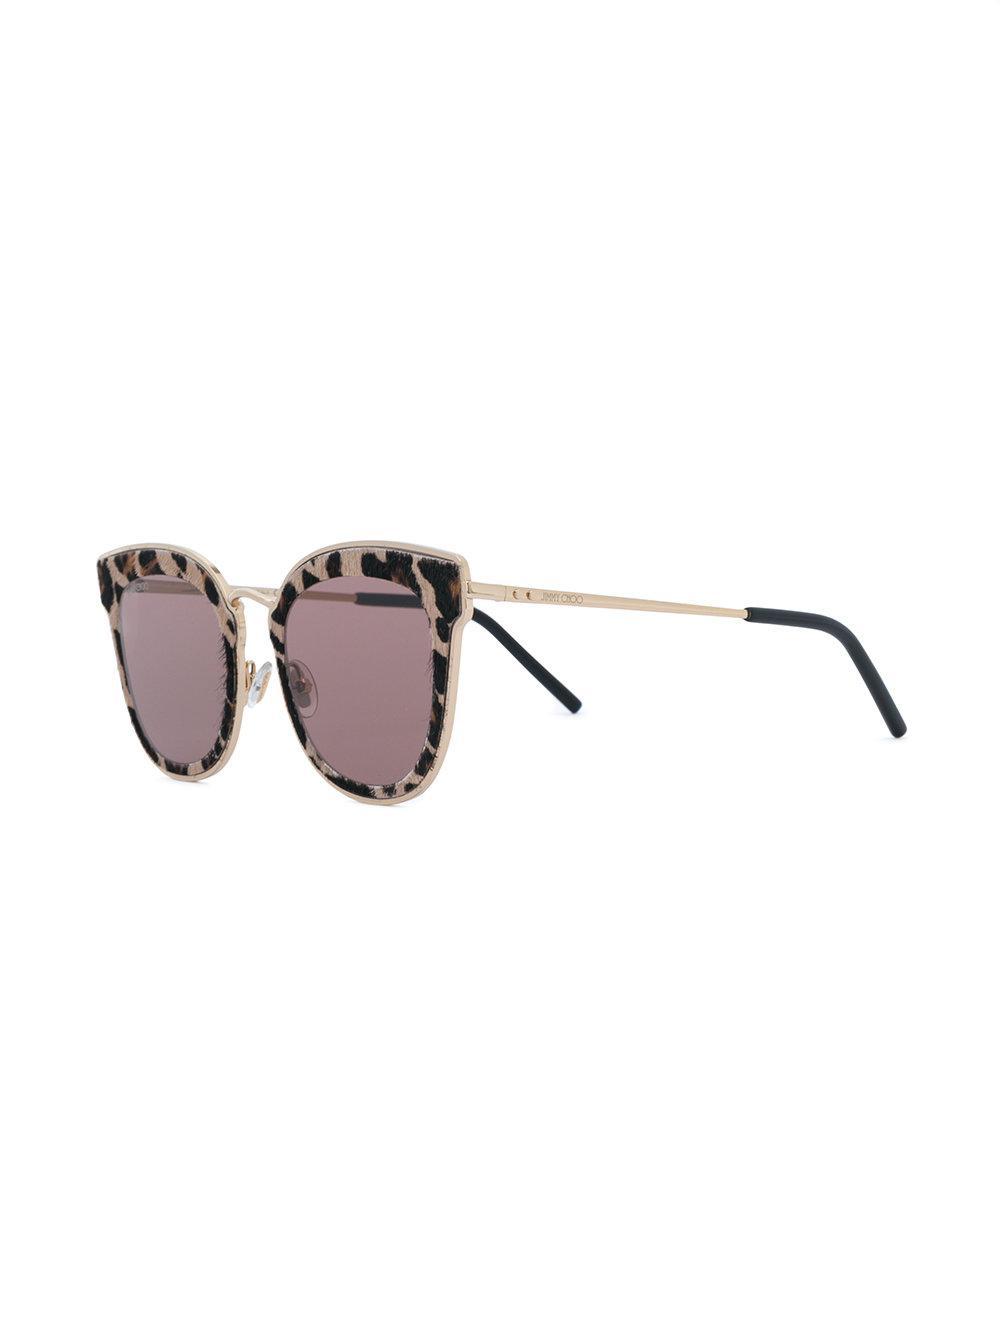 e2c39a651a7 Jimmy Choo - Brown Niles Sunglasses - Lyst. View fullscreen